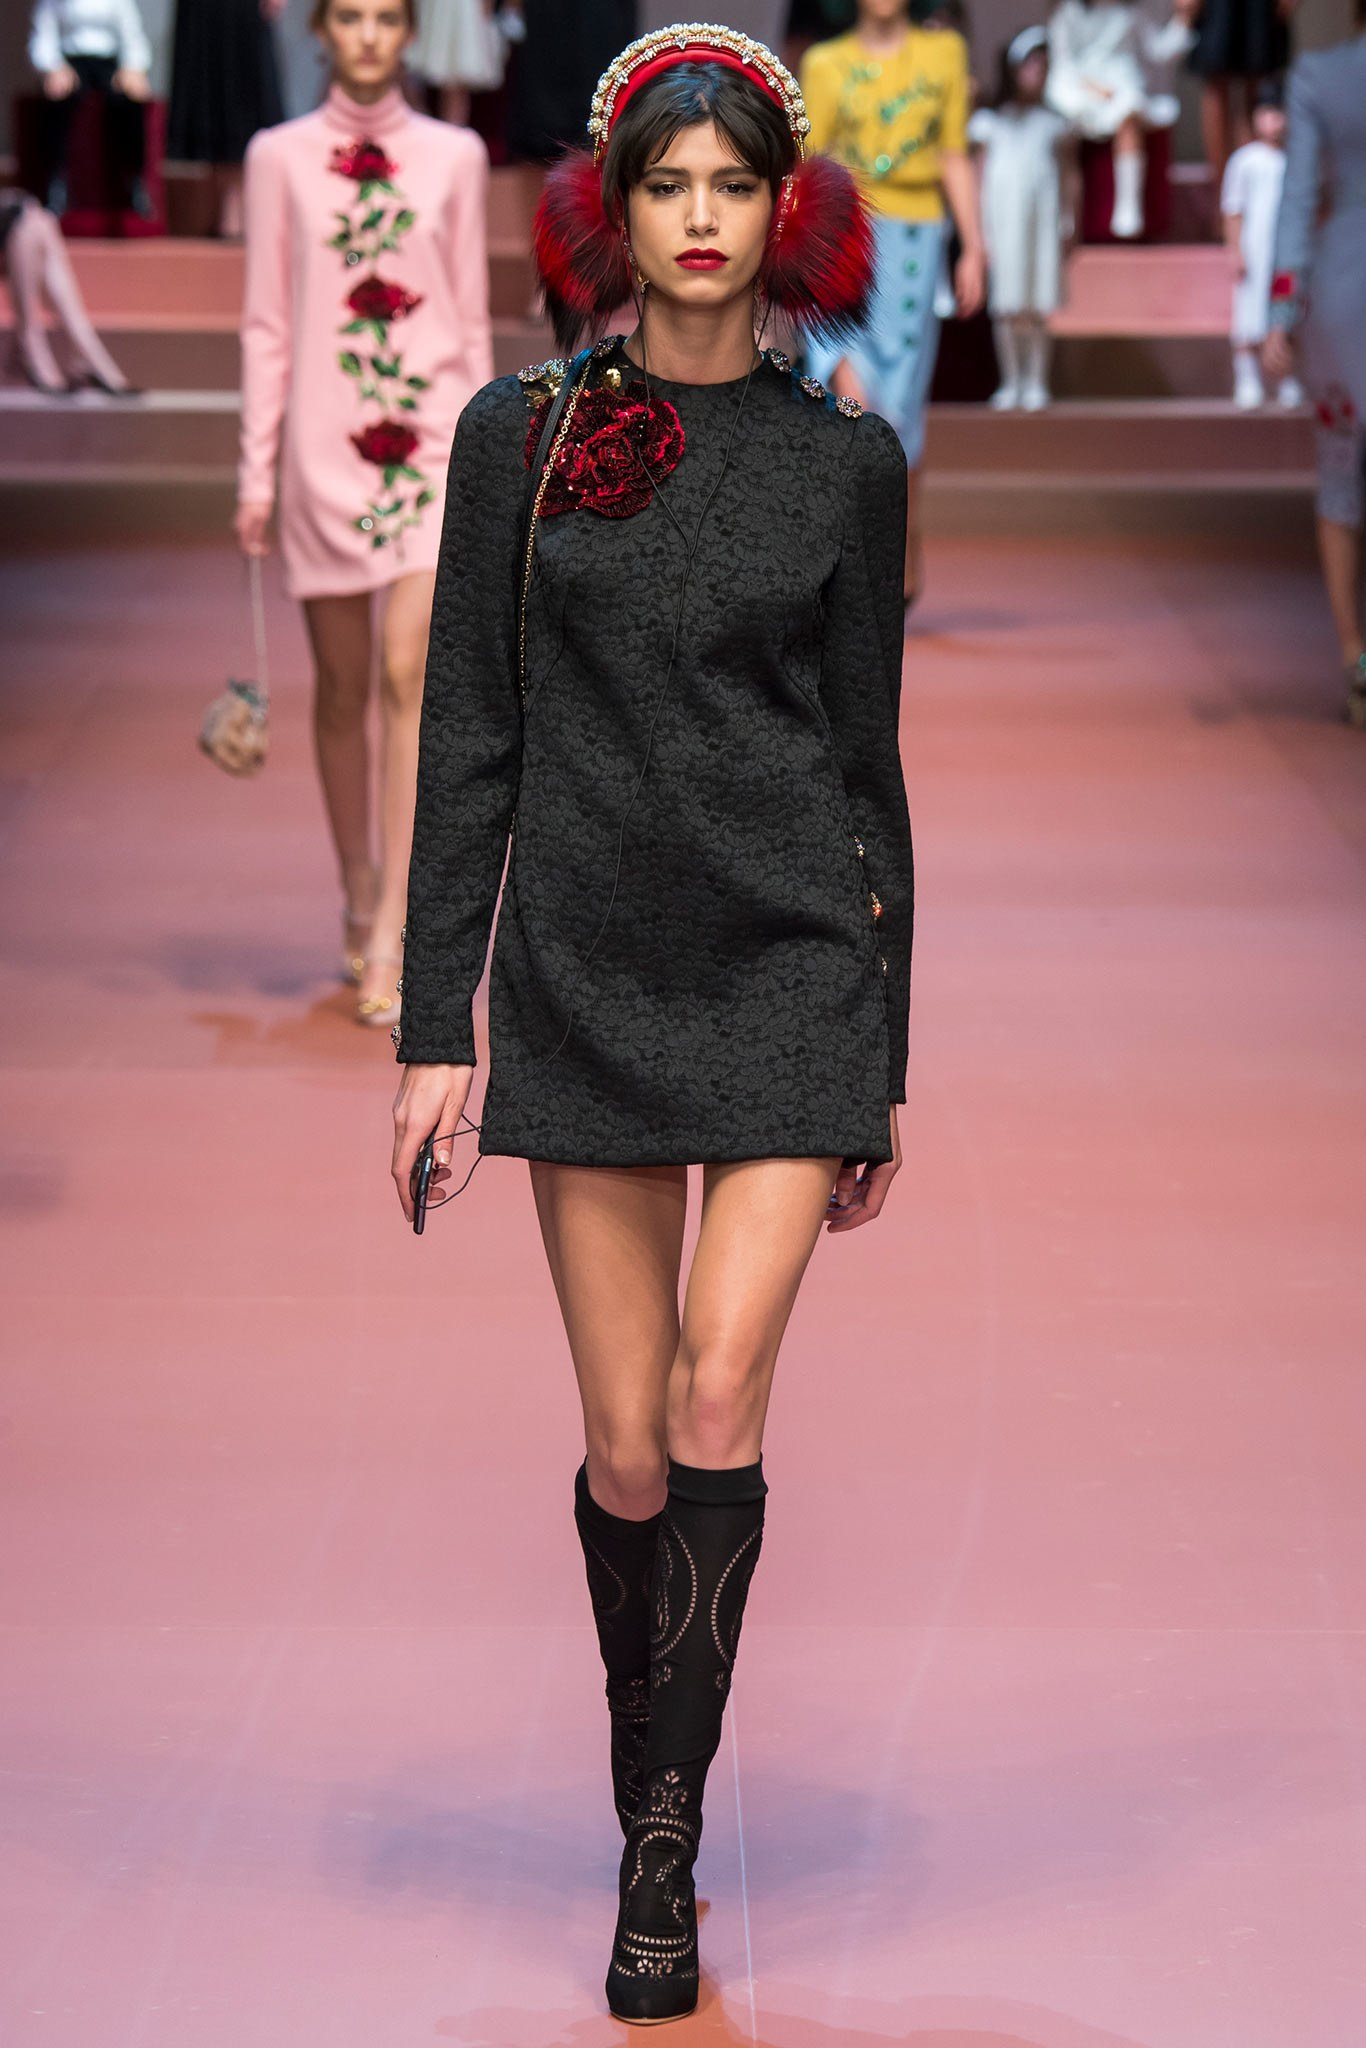 Dolce and Gabbana Fall 2015 RTW